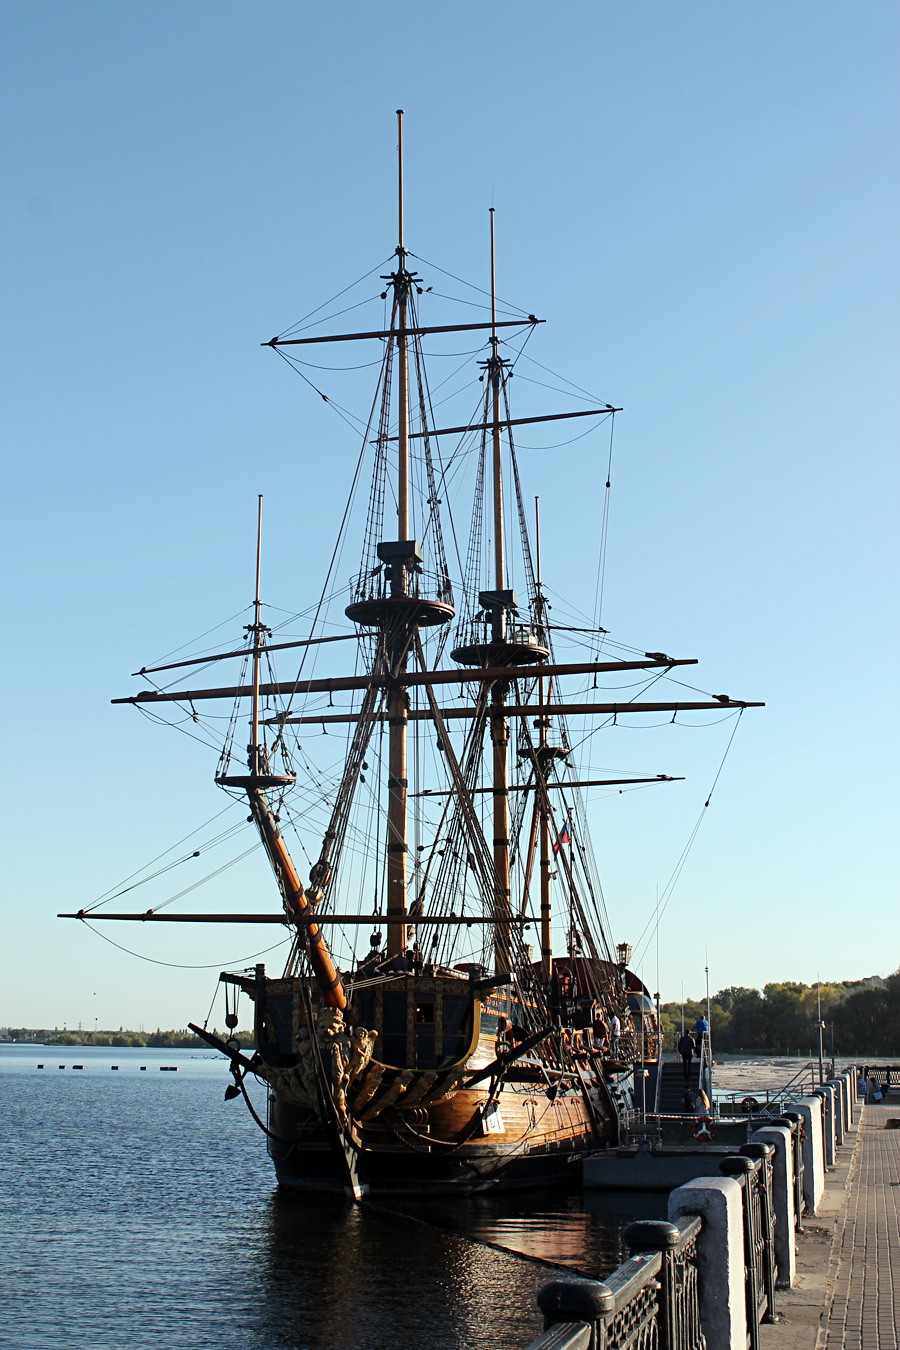 The Goto Predestinatsia warship.